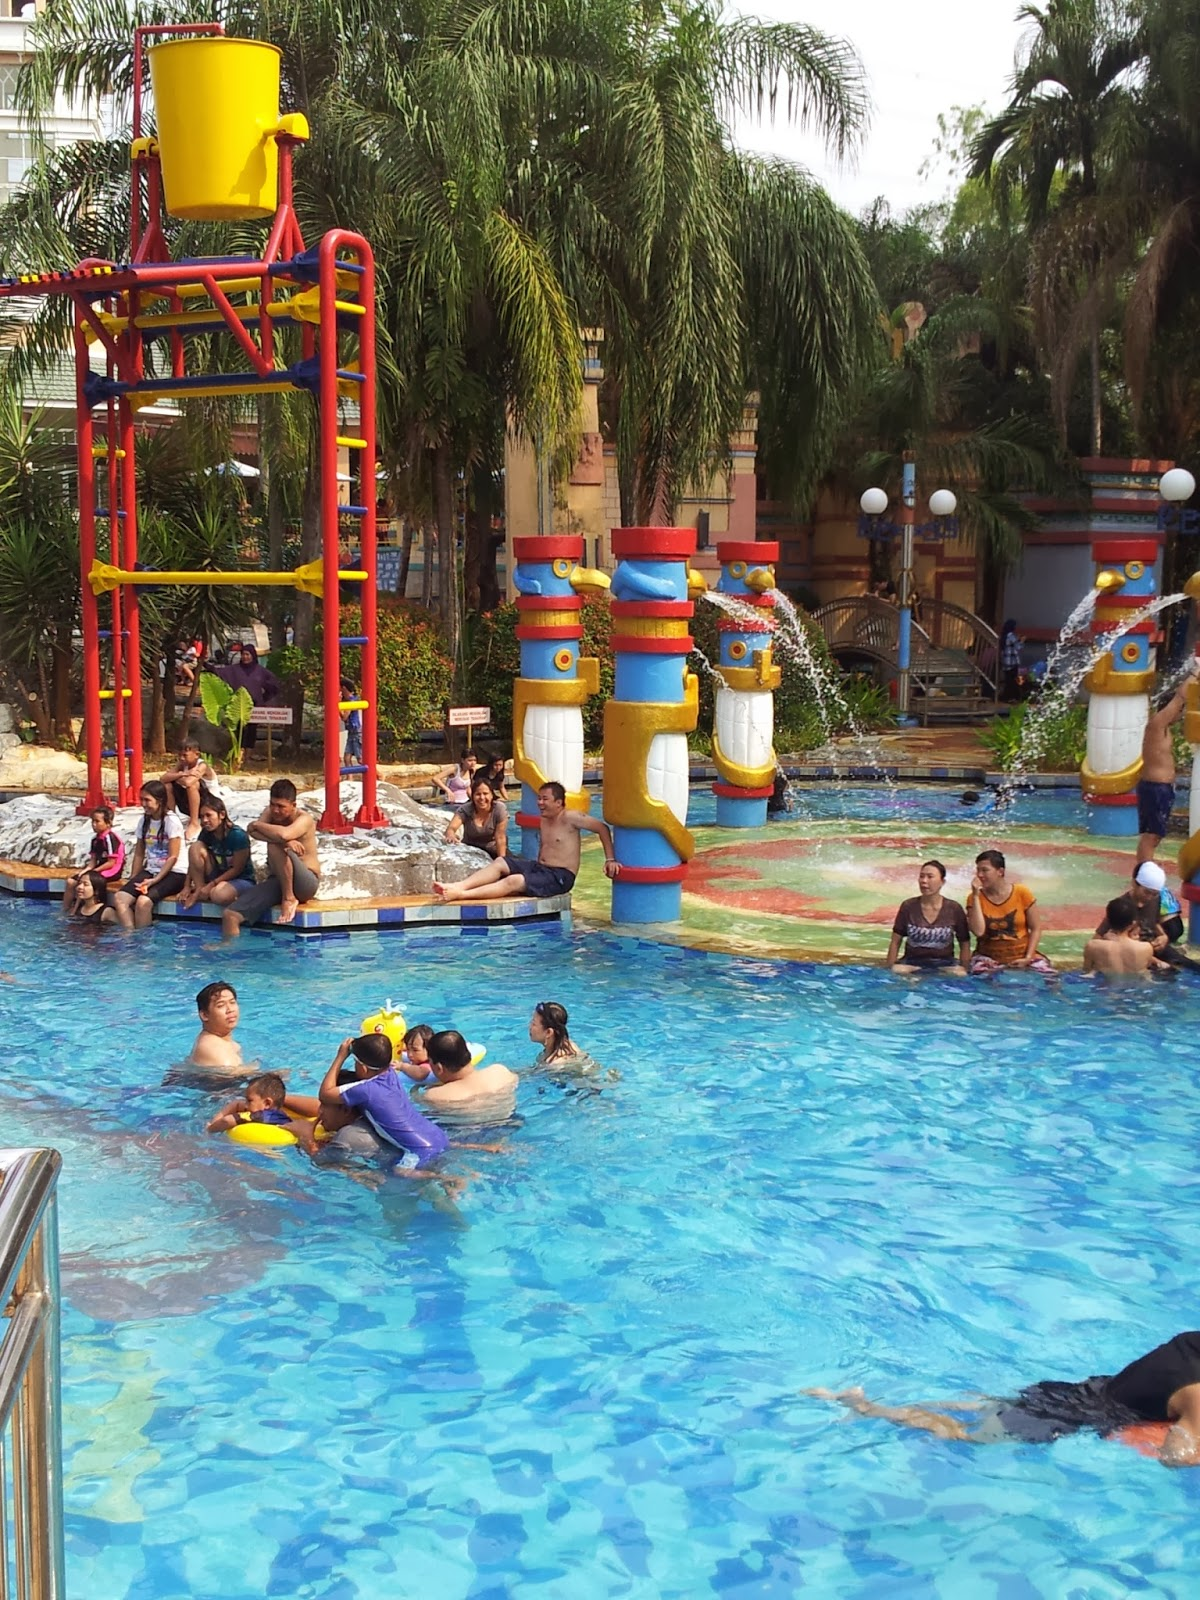 Htm Kolam Renang Rumah Ibu Cibubur Voucher  Tiket Masuk Megati Waterpark Cikarang Promo Happy Time Eldorado Legenda Wisata All